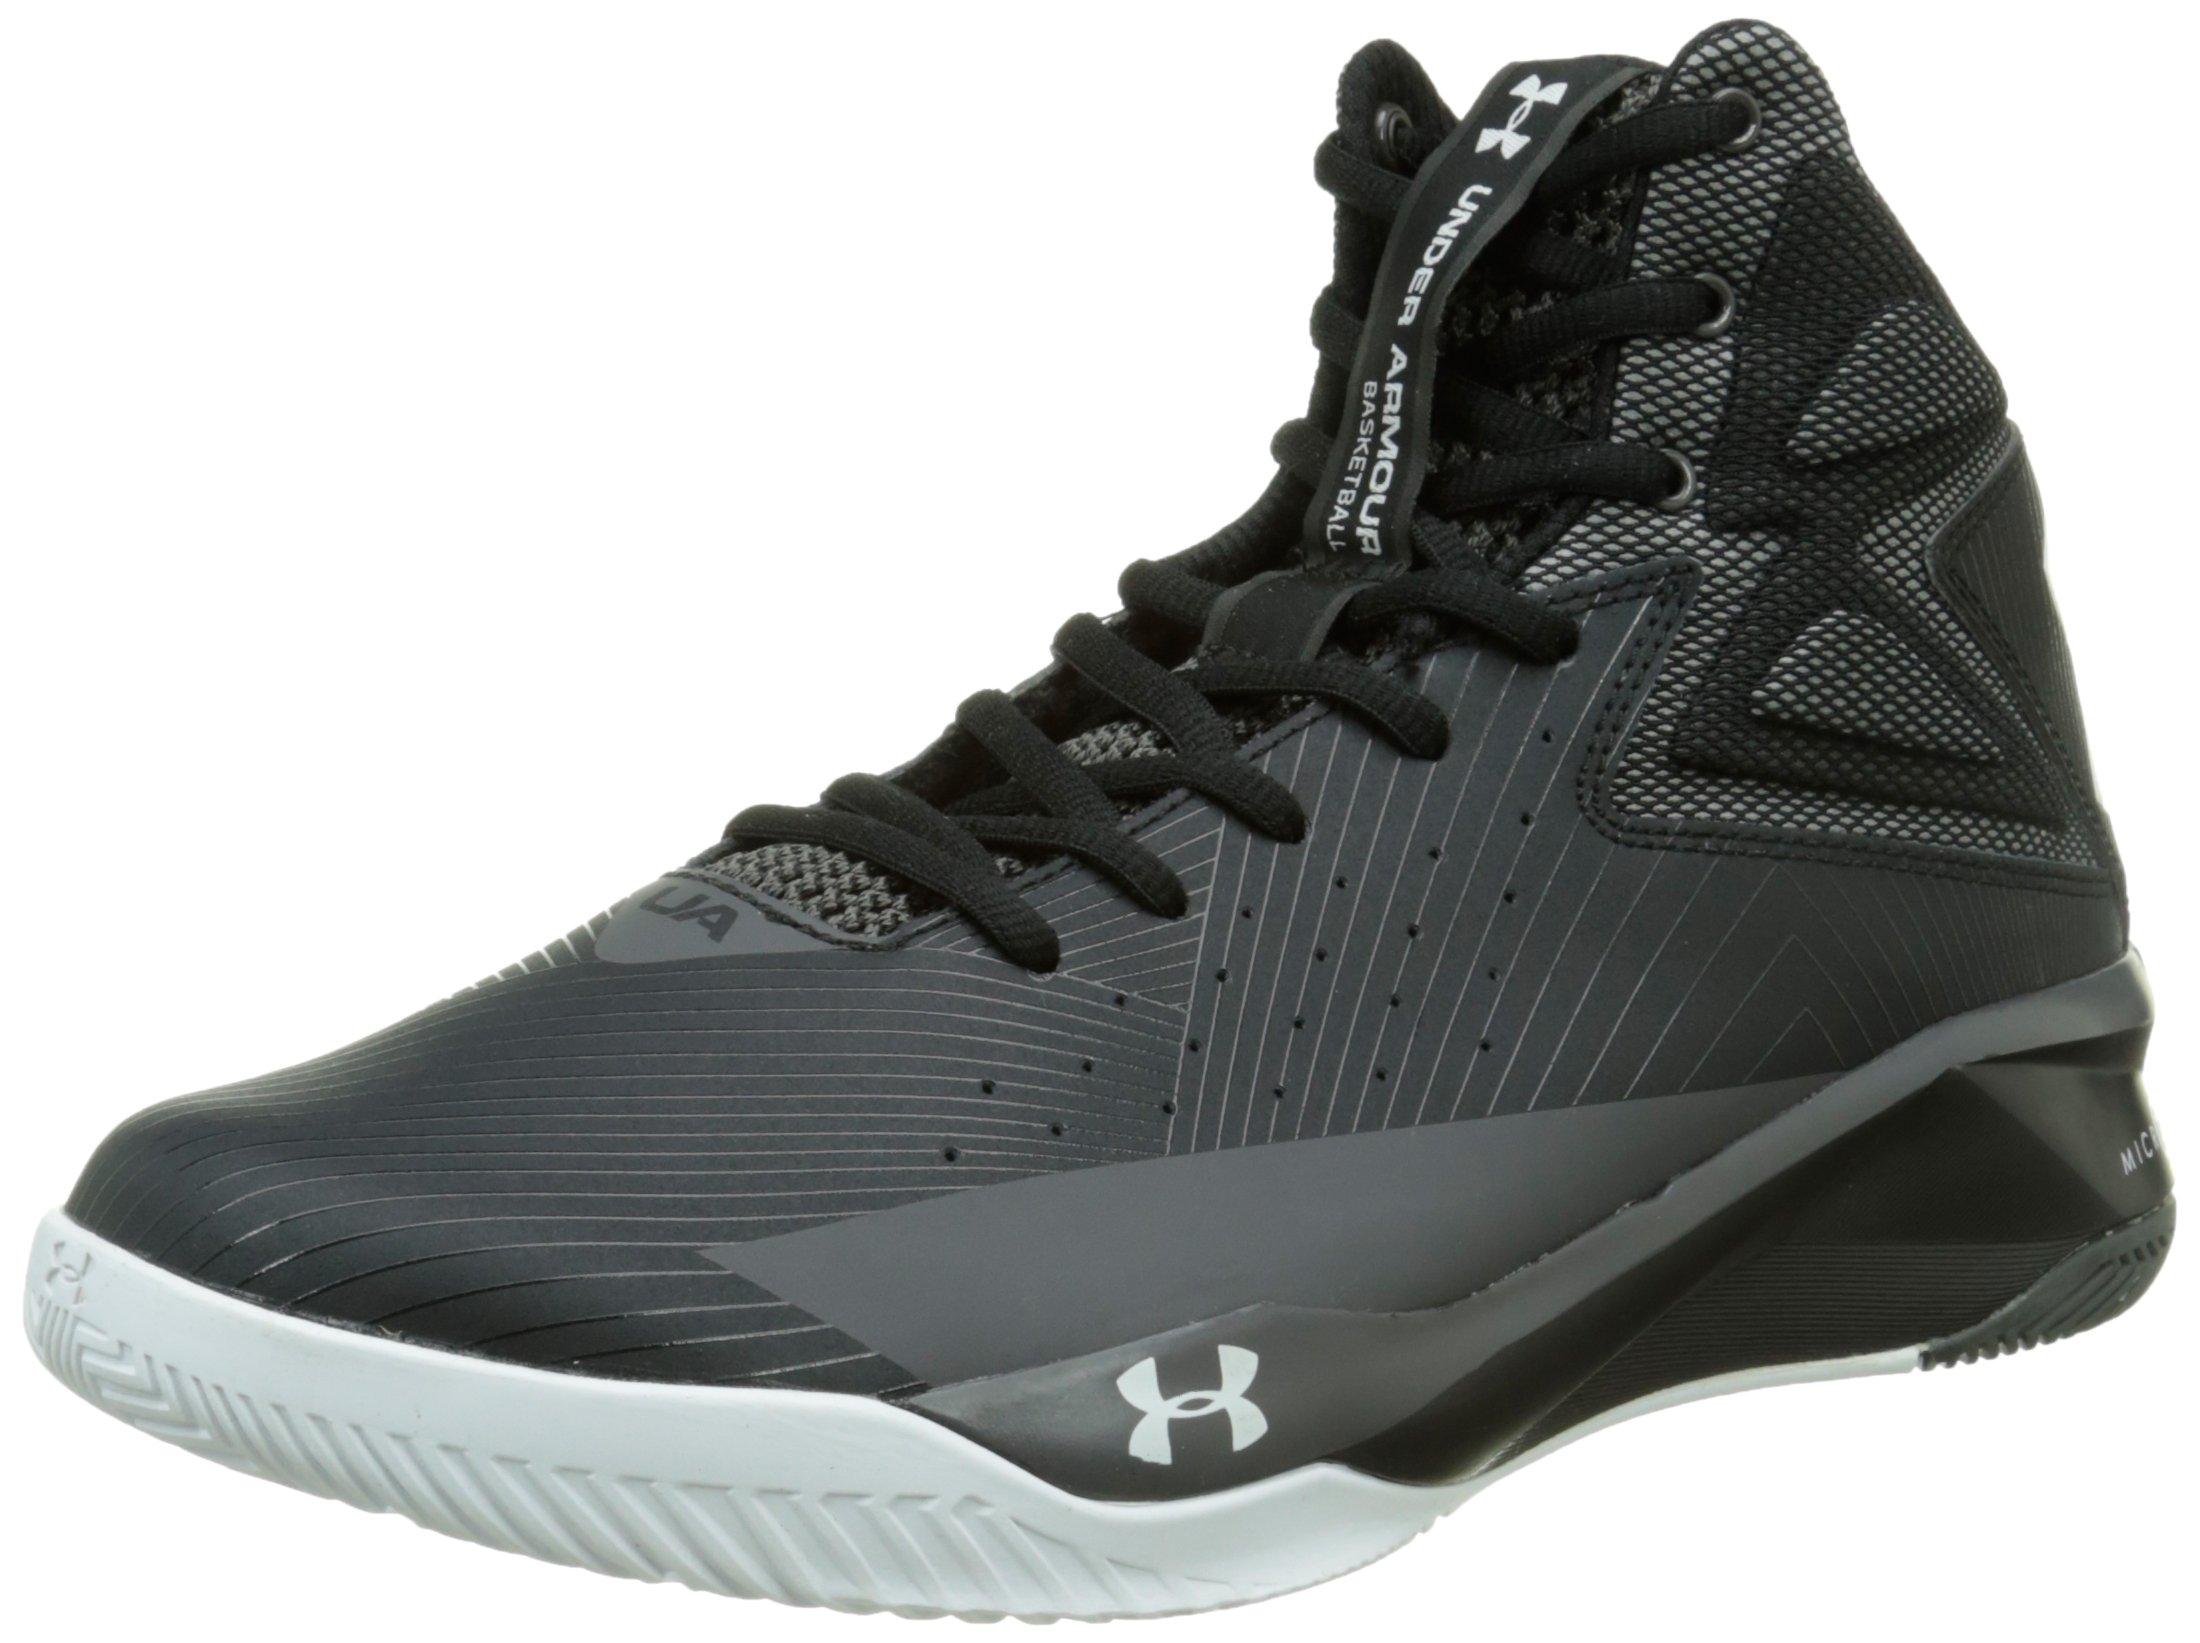 Under Armour Mens UA Rocket Basketball Shoes Black/White/Charcoal 8 D(M) US